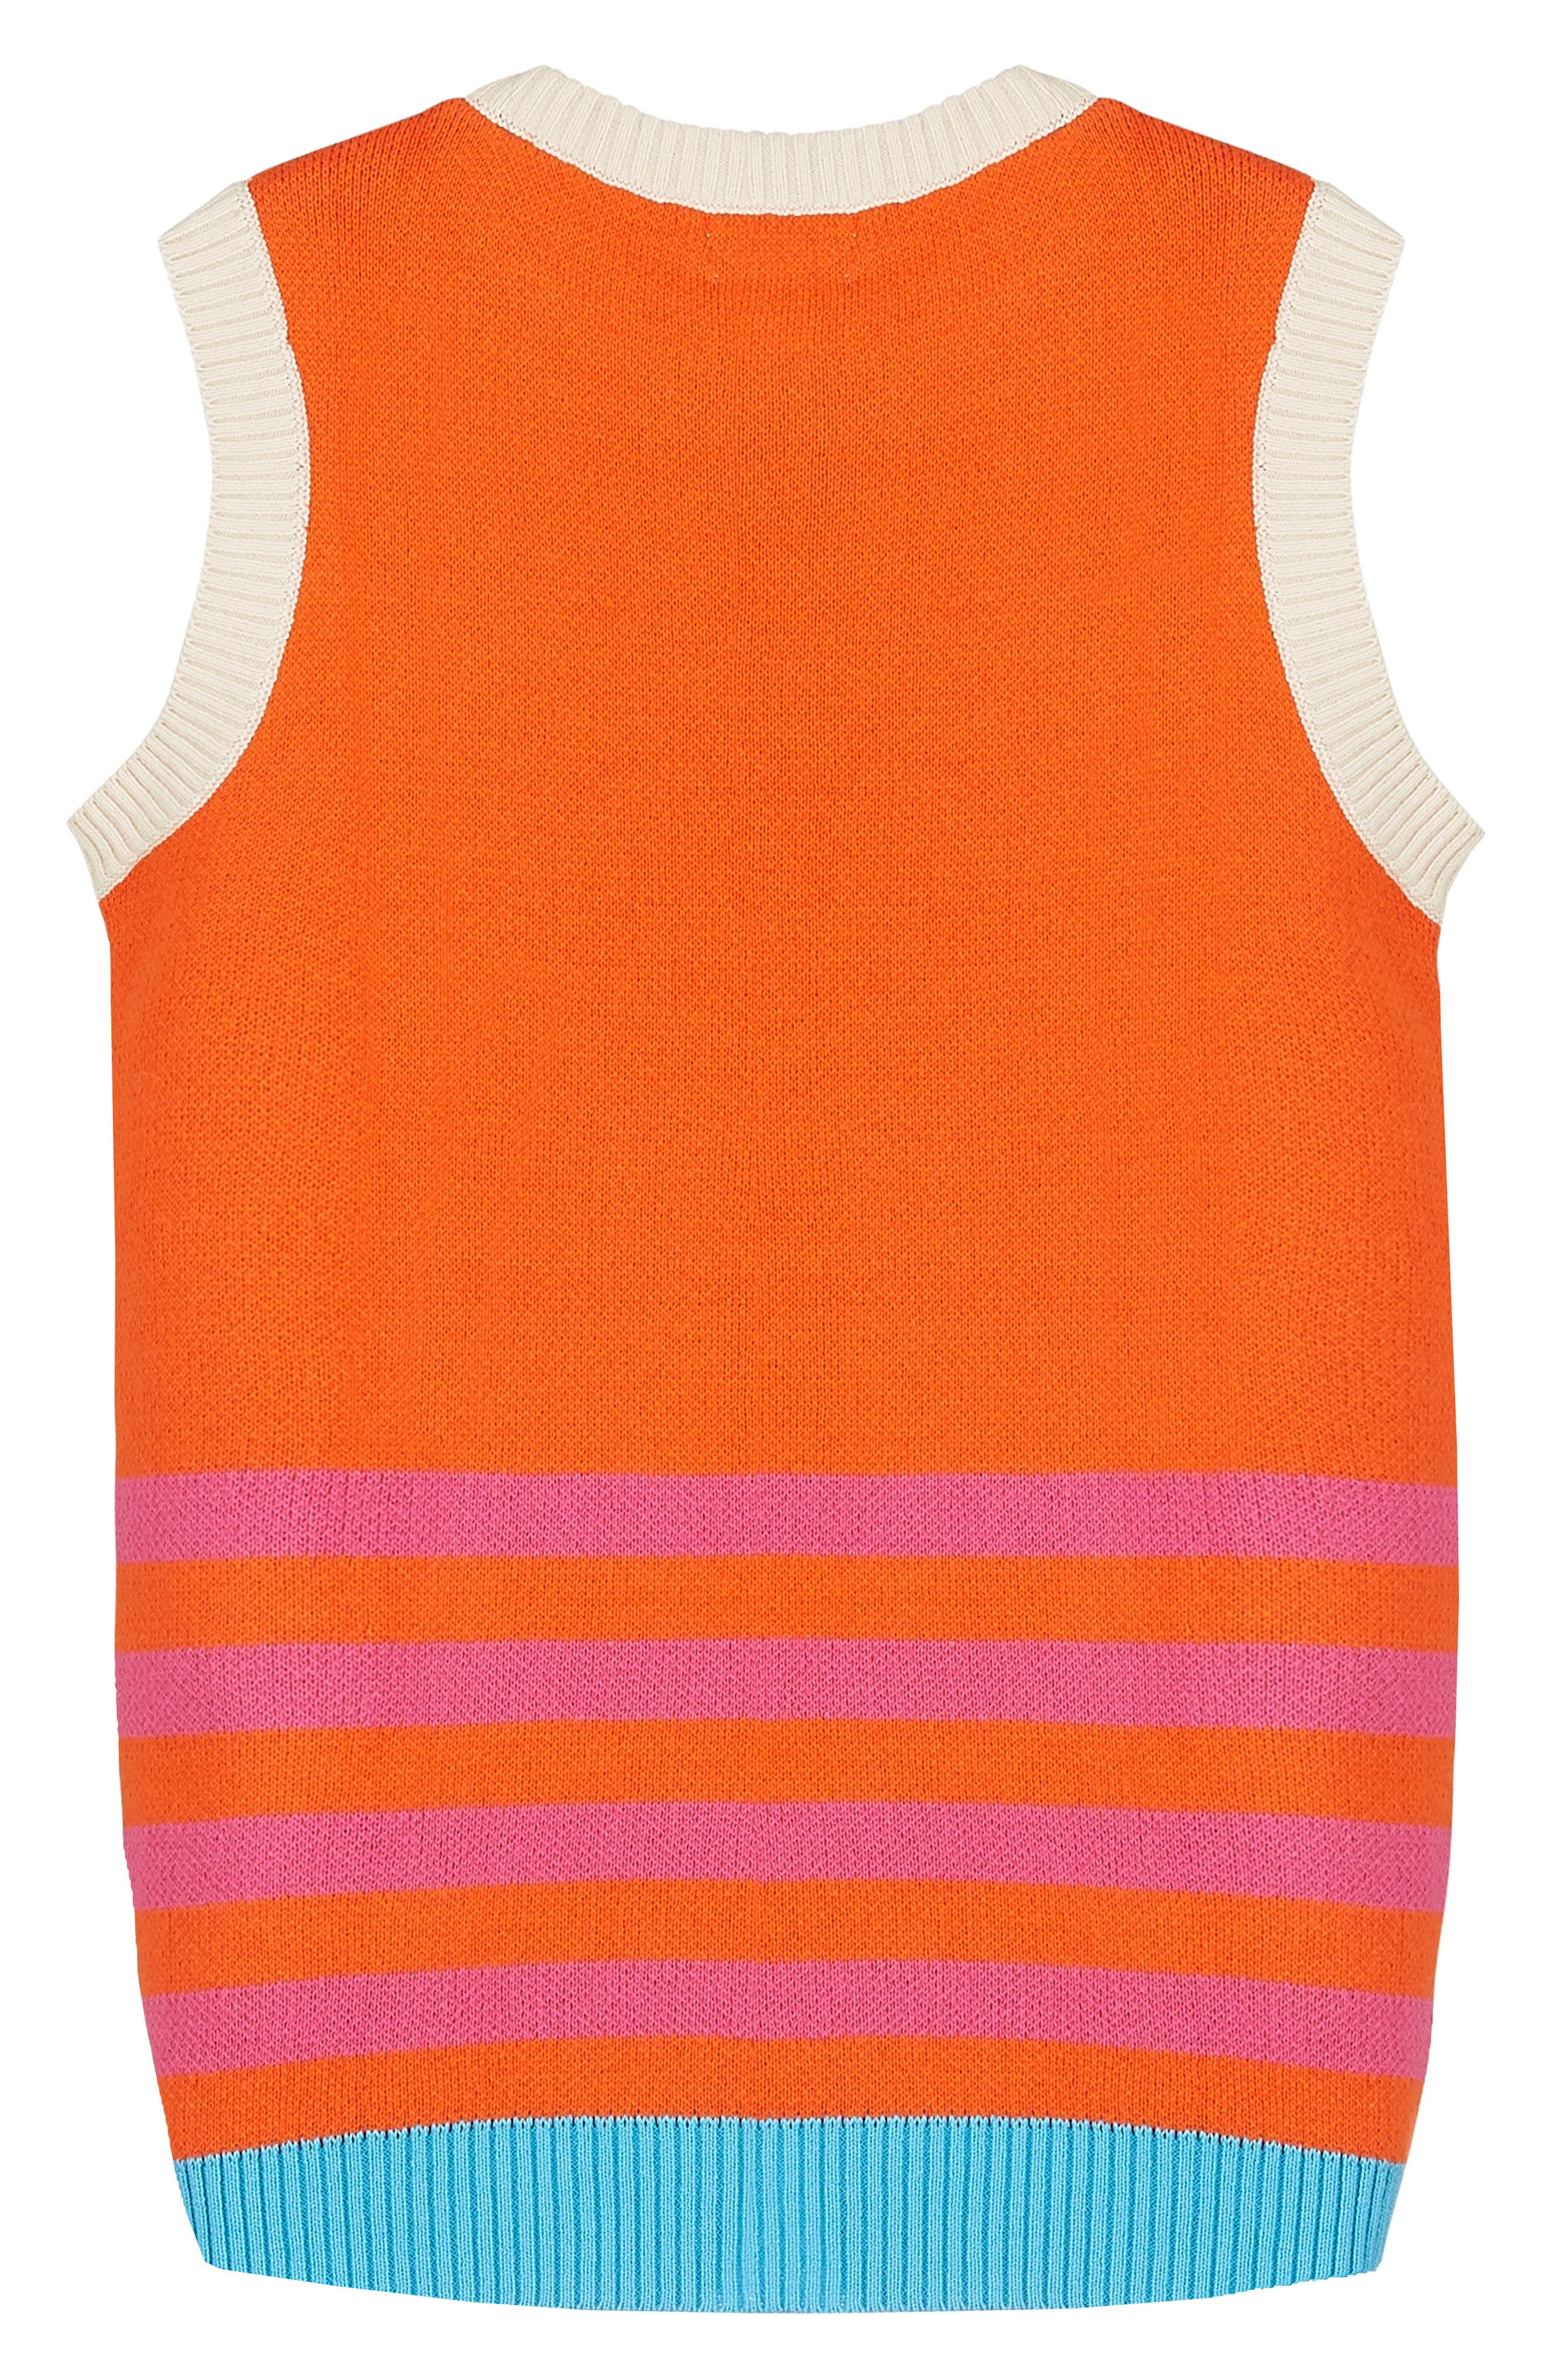 Alternate Image 2  - Margherita Retro Colorblock Sweater Knit Dress (Toddler Girls & Little Girls)